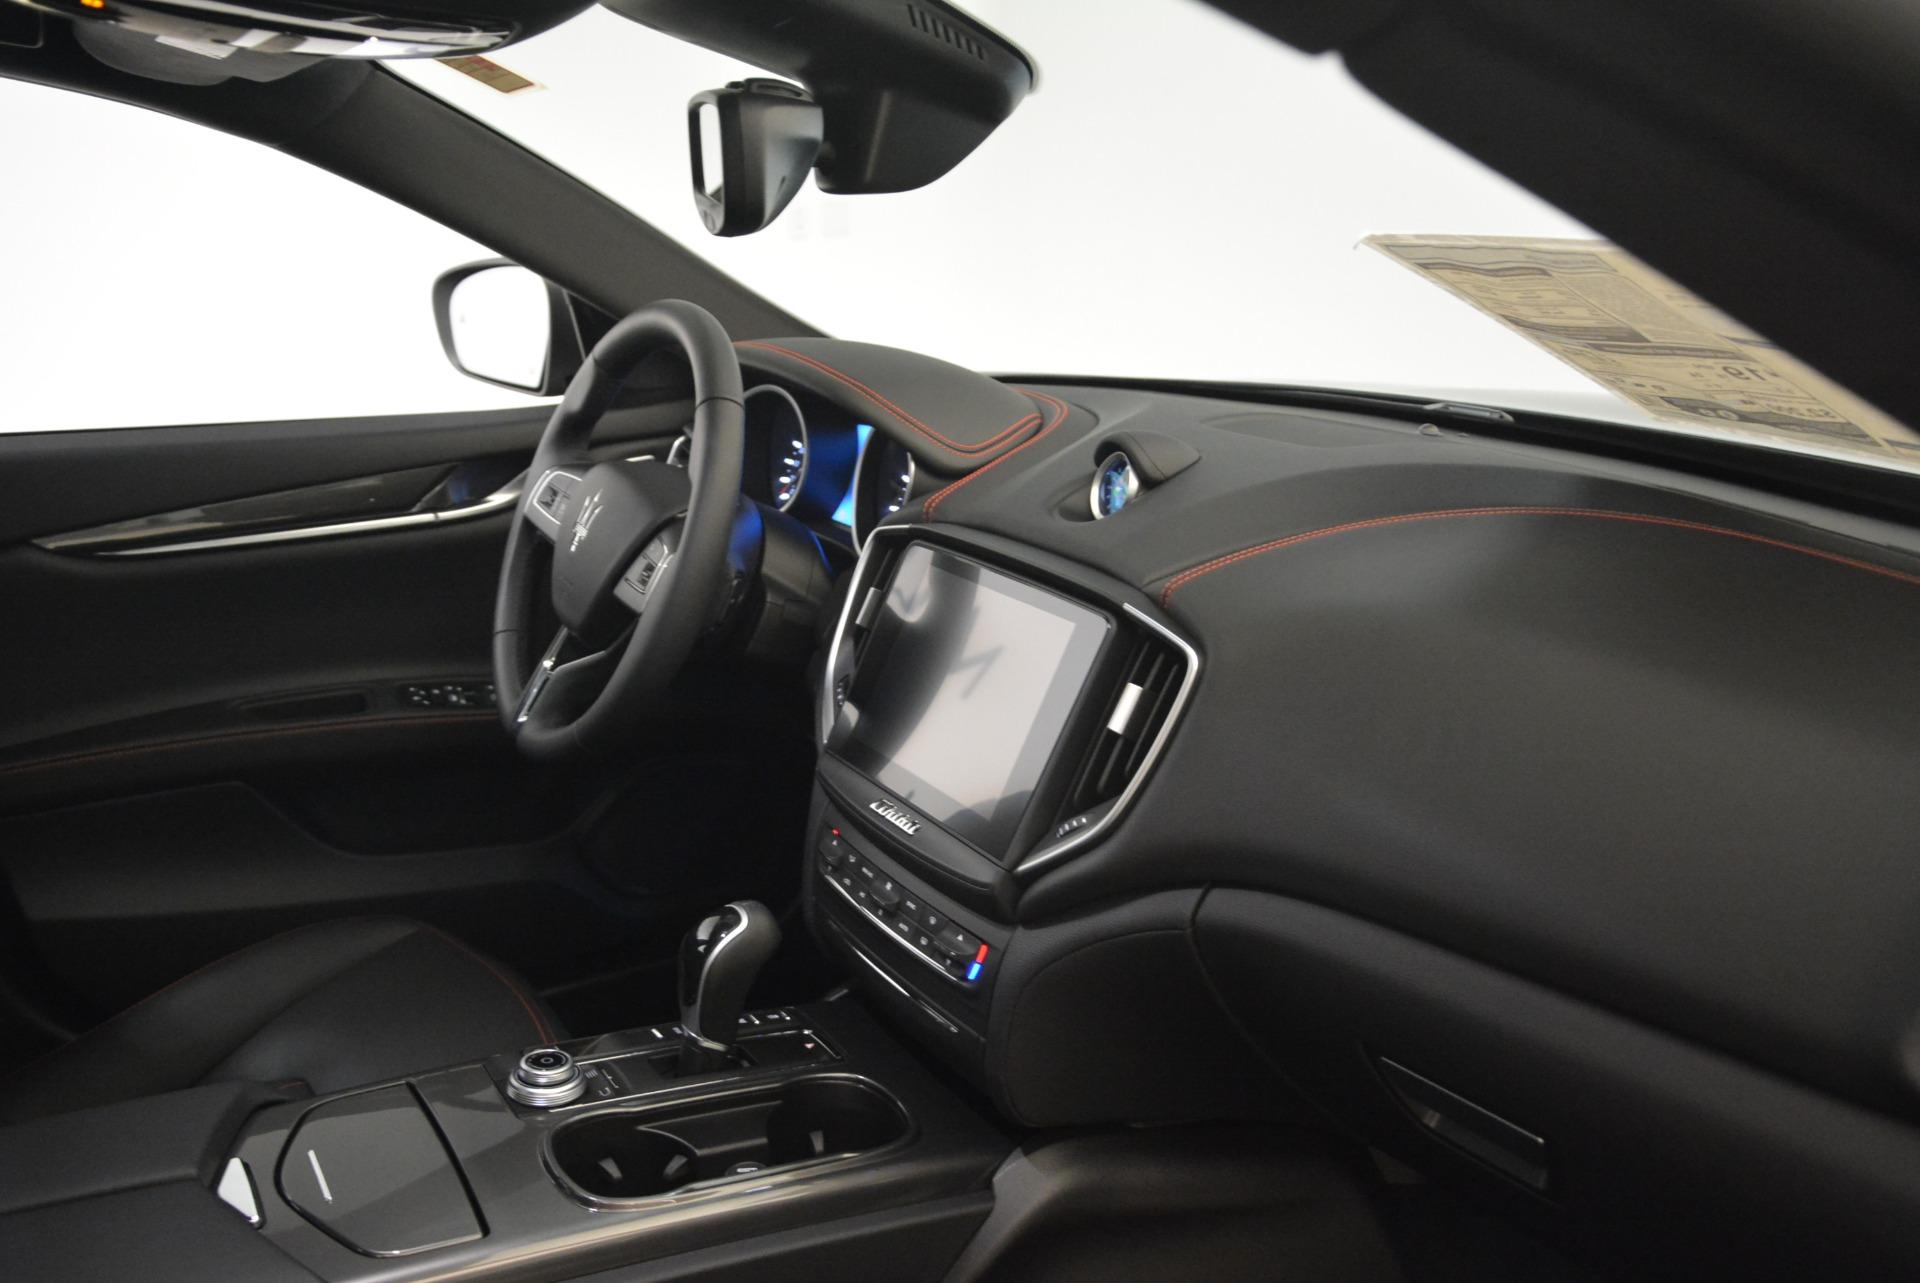 Used 2018 Maserati Ghibli S Q4 For Sale In Greenwich, CT. Alfa Romeo of Greenwich, M2143 2271_p18